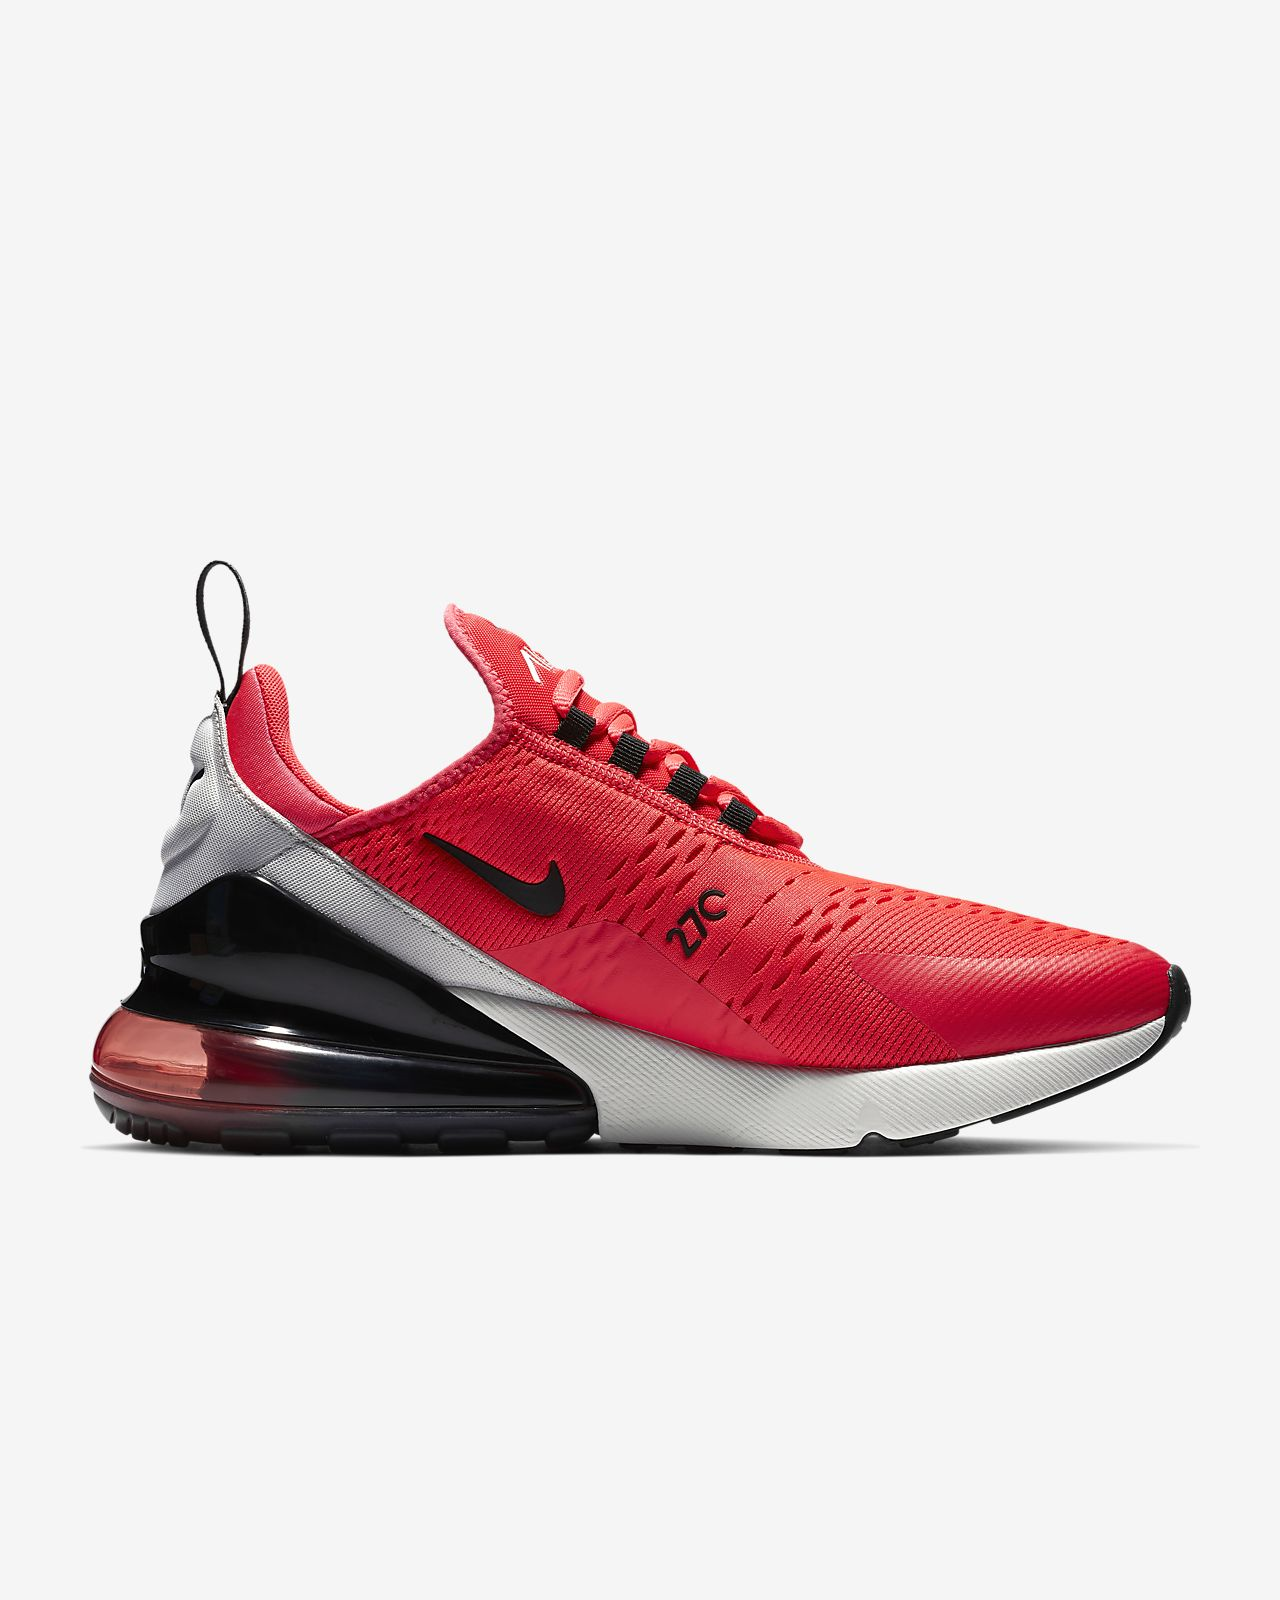 2f9d108812cb2 Nike Air Max 270 Men's Shoe. Nike.com